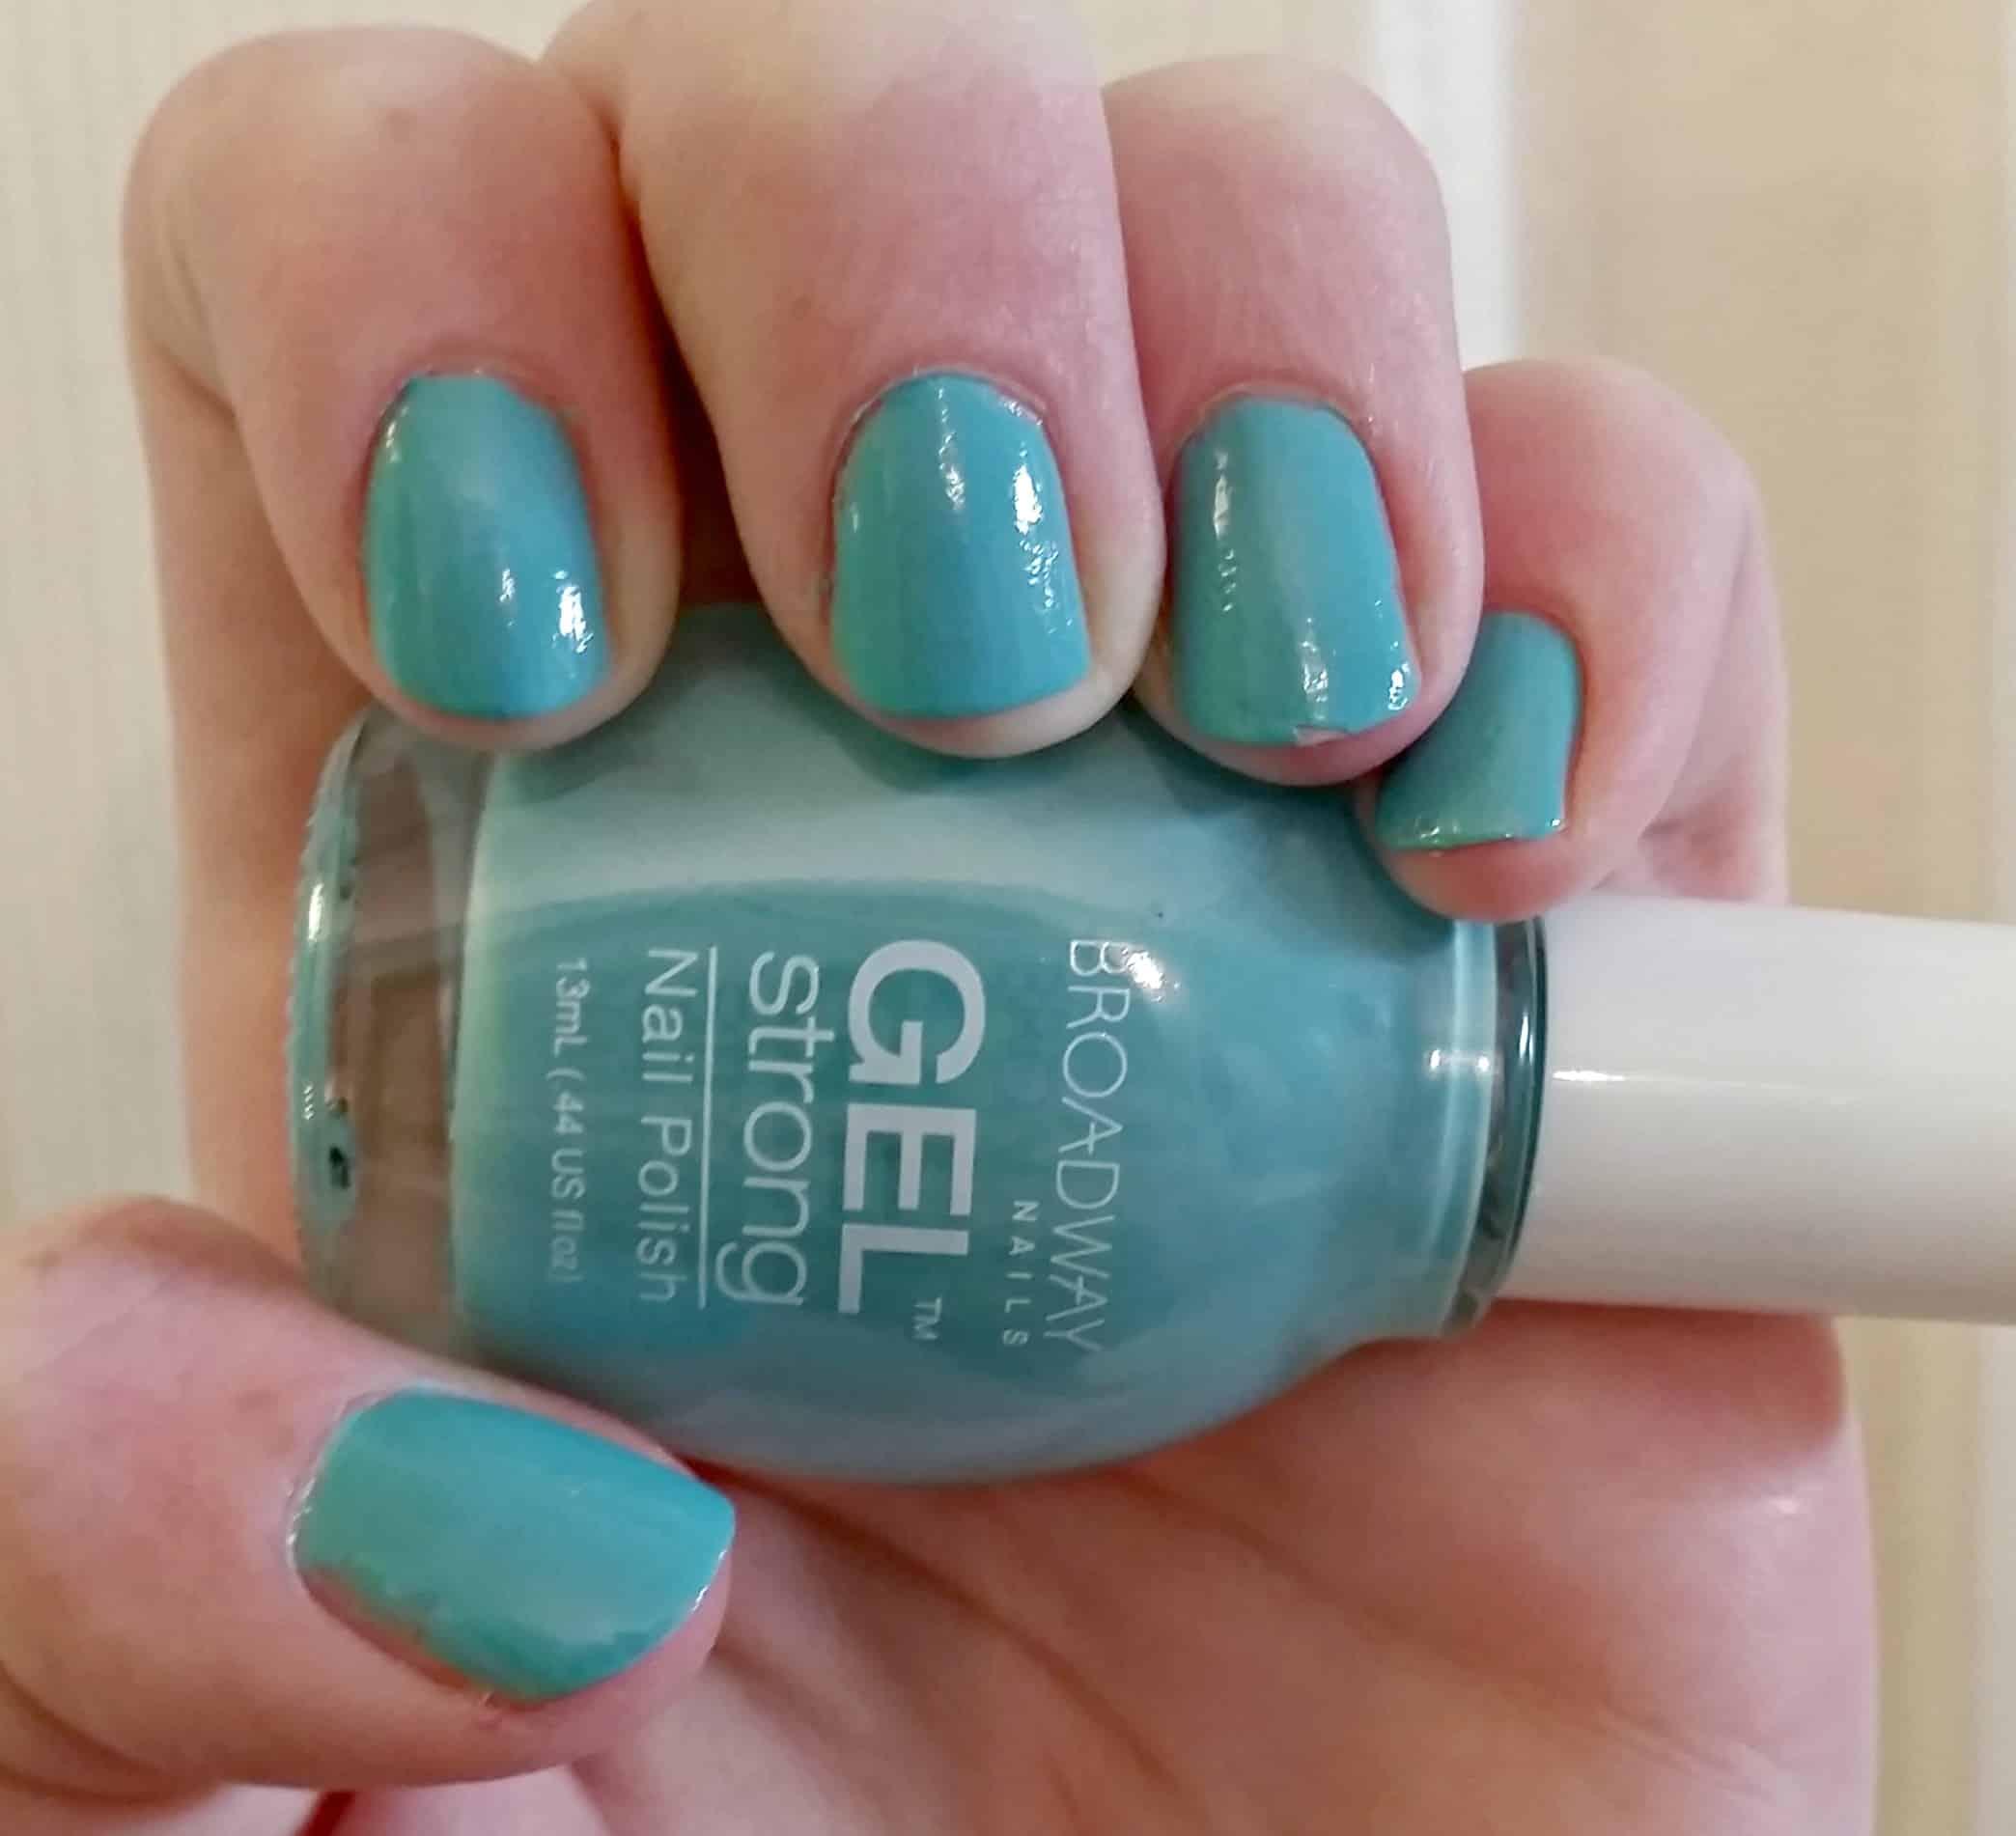 Secrets for a Perfect DIY Manicure